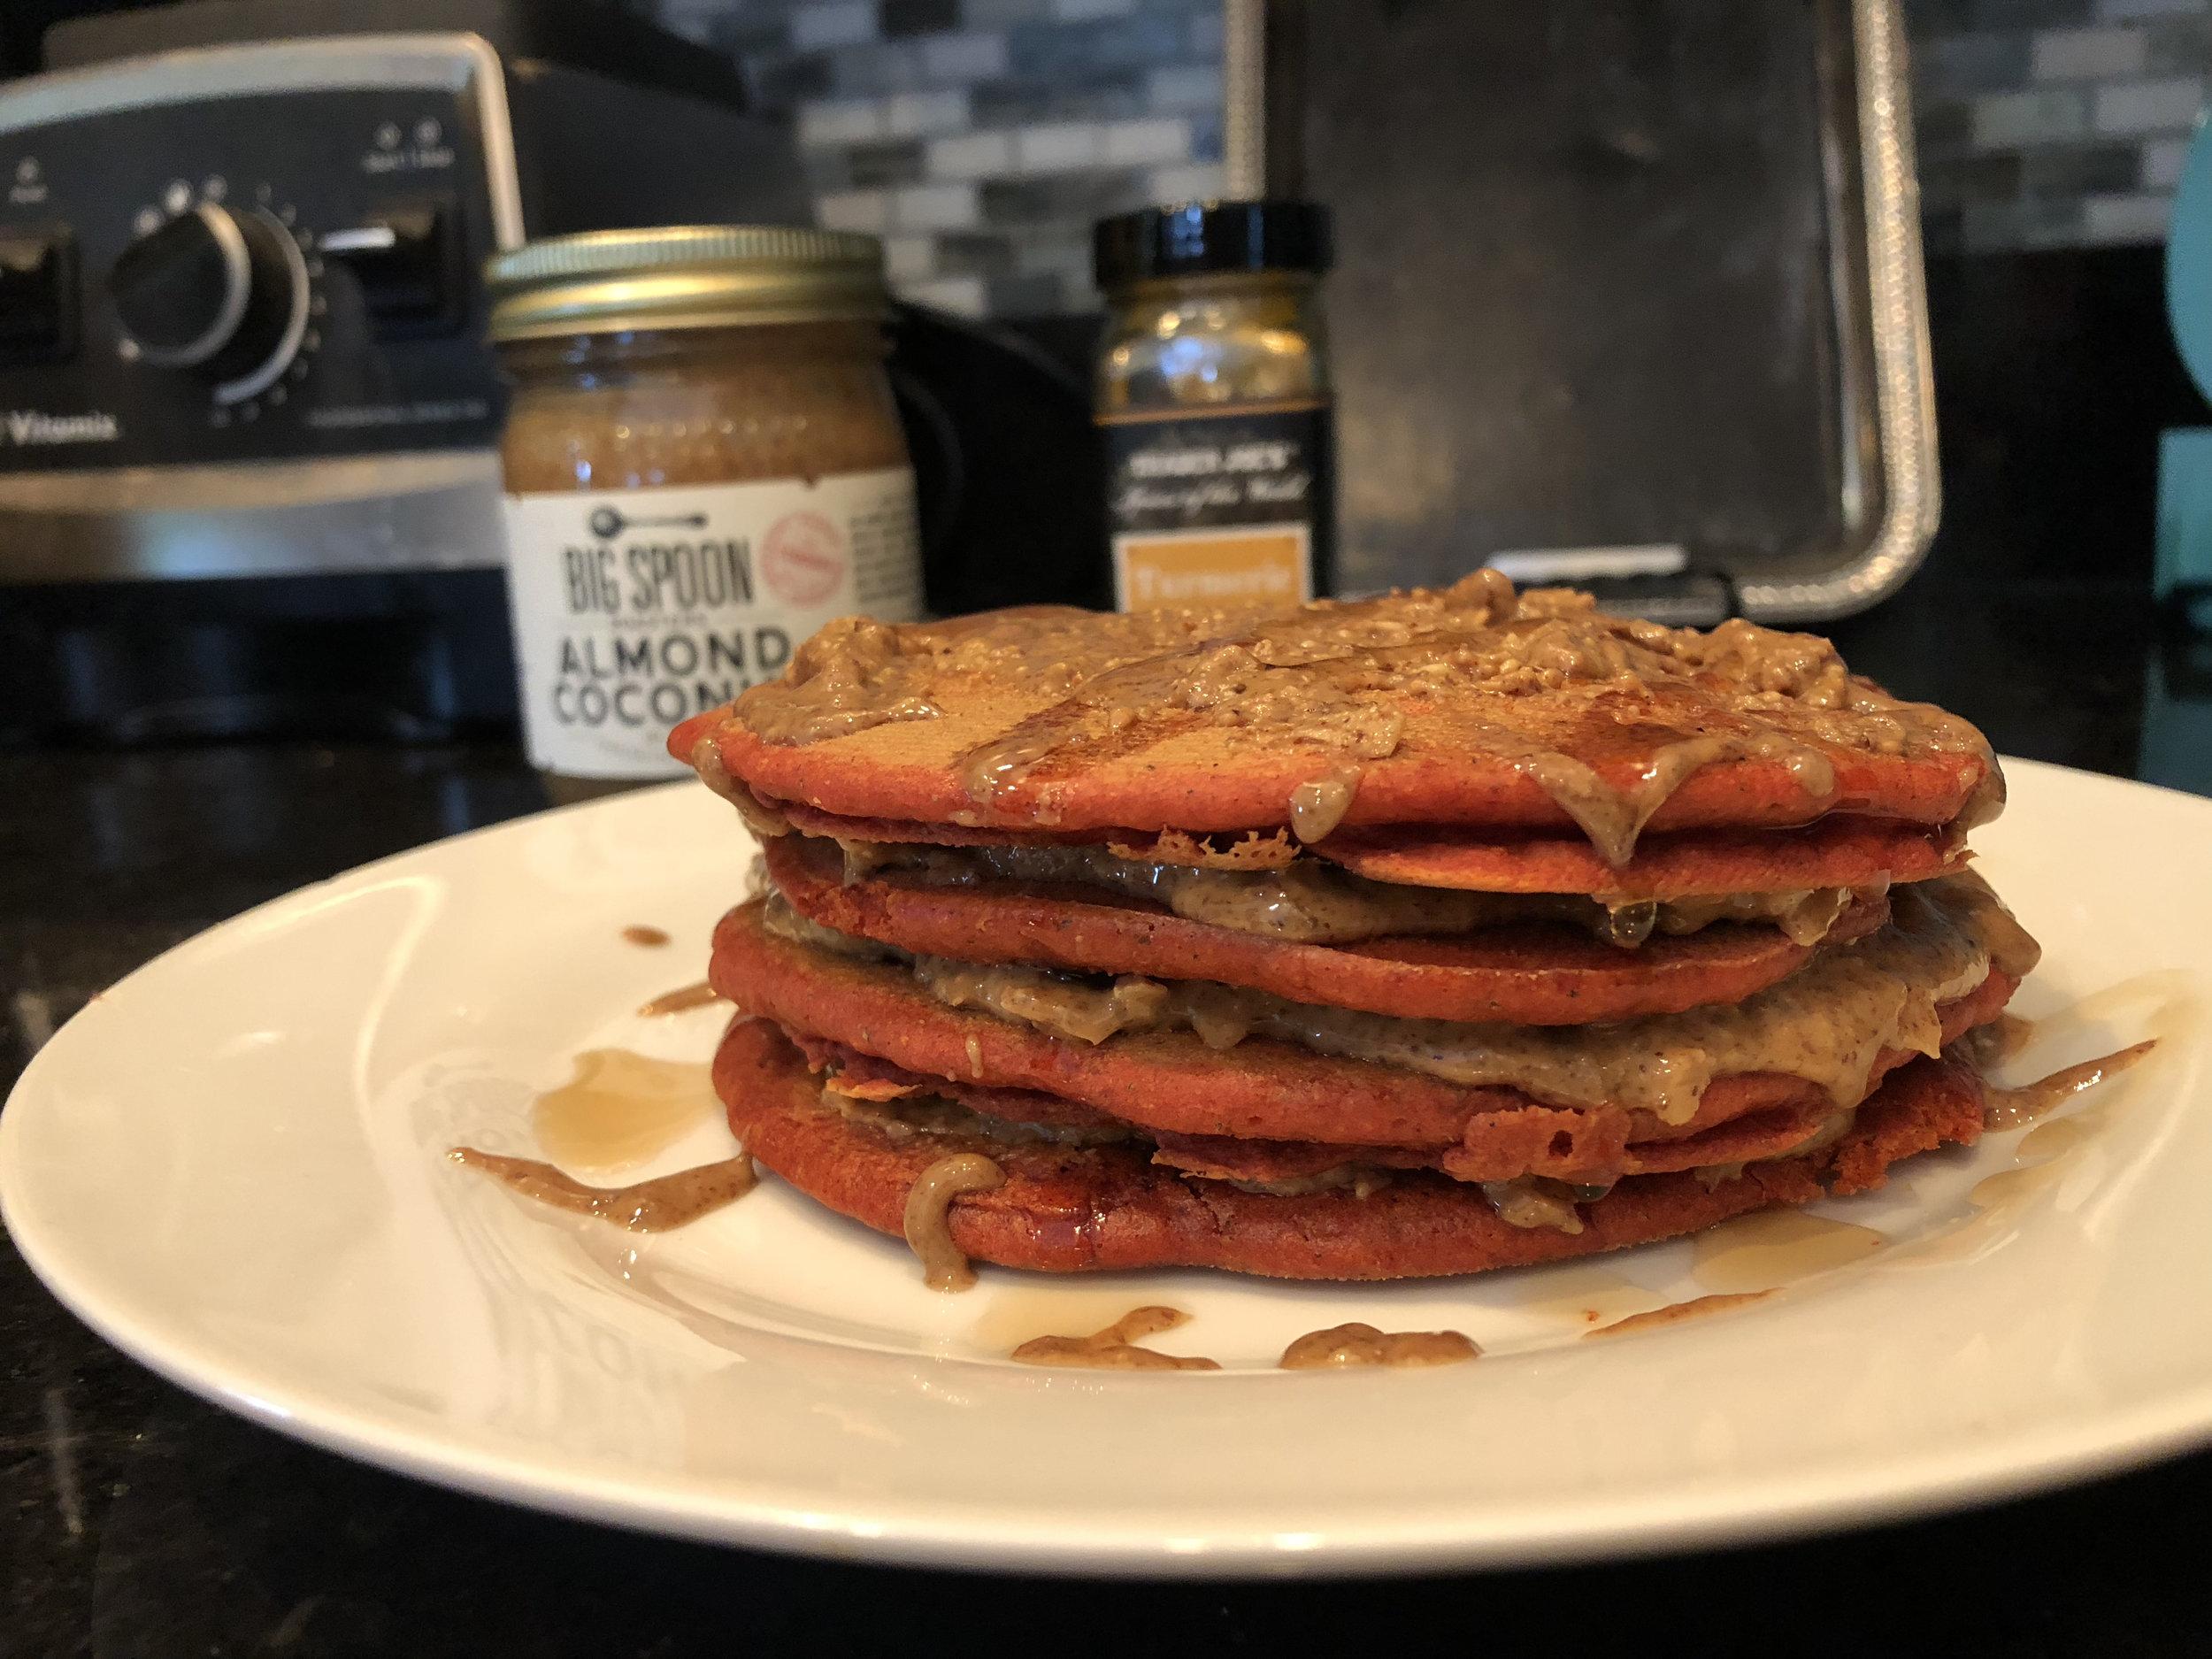 Anti-Inflammatory Turmeric Pancakes with Big Spoon Roasters